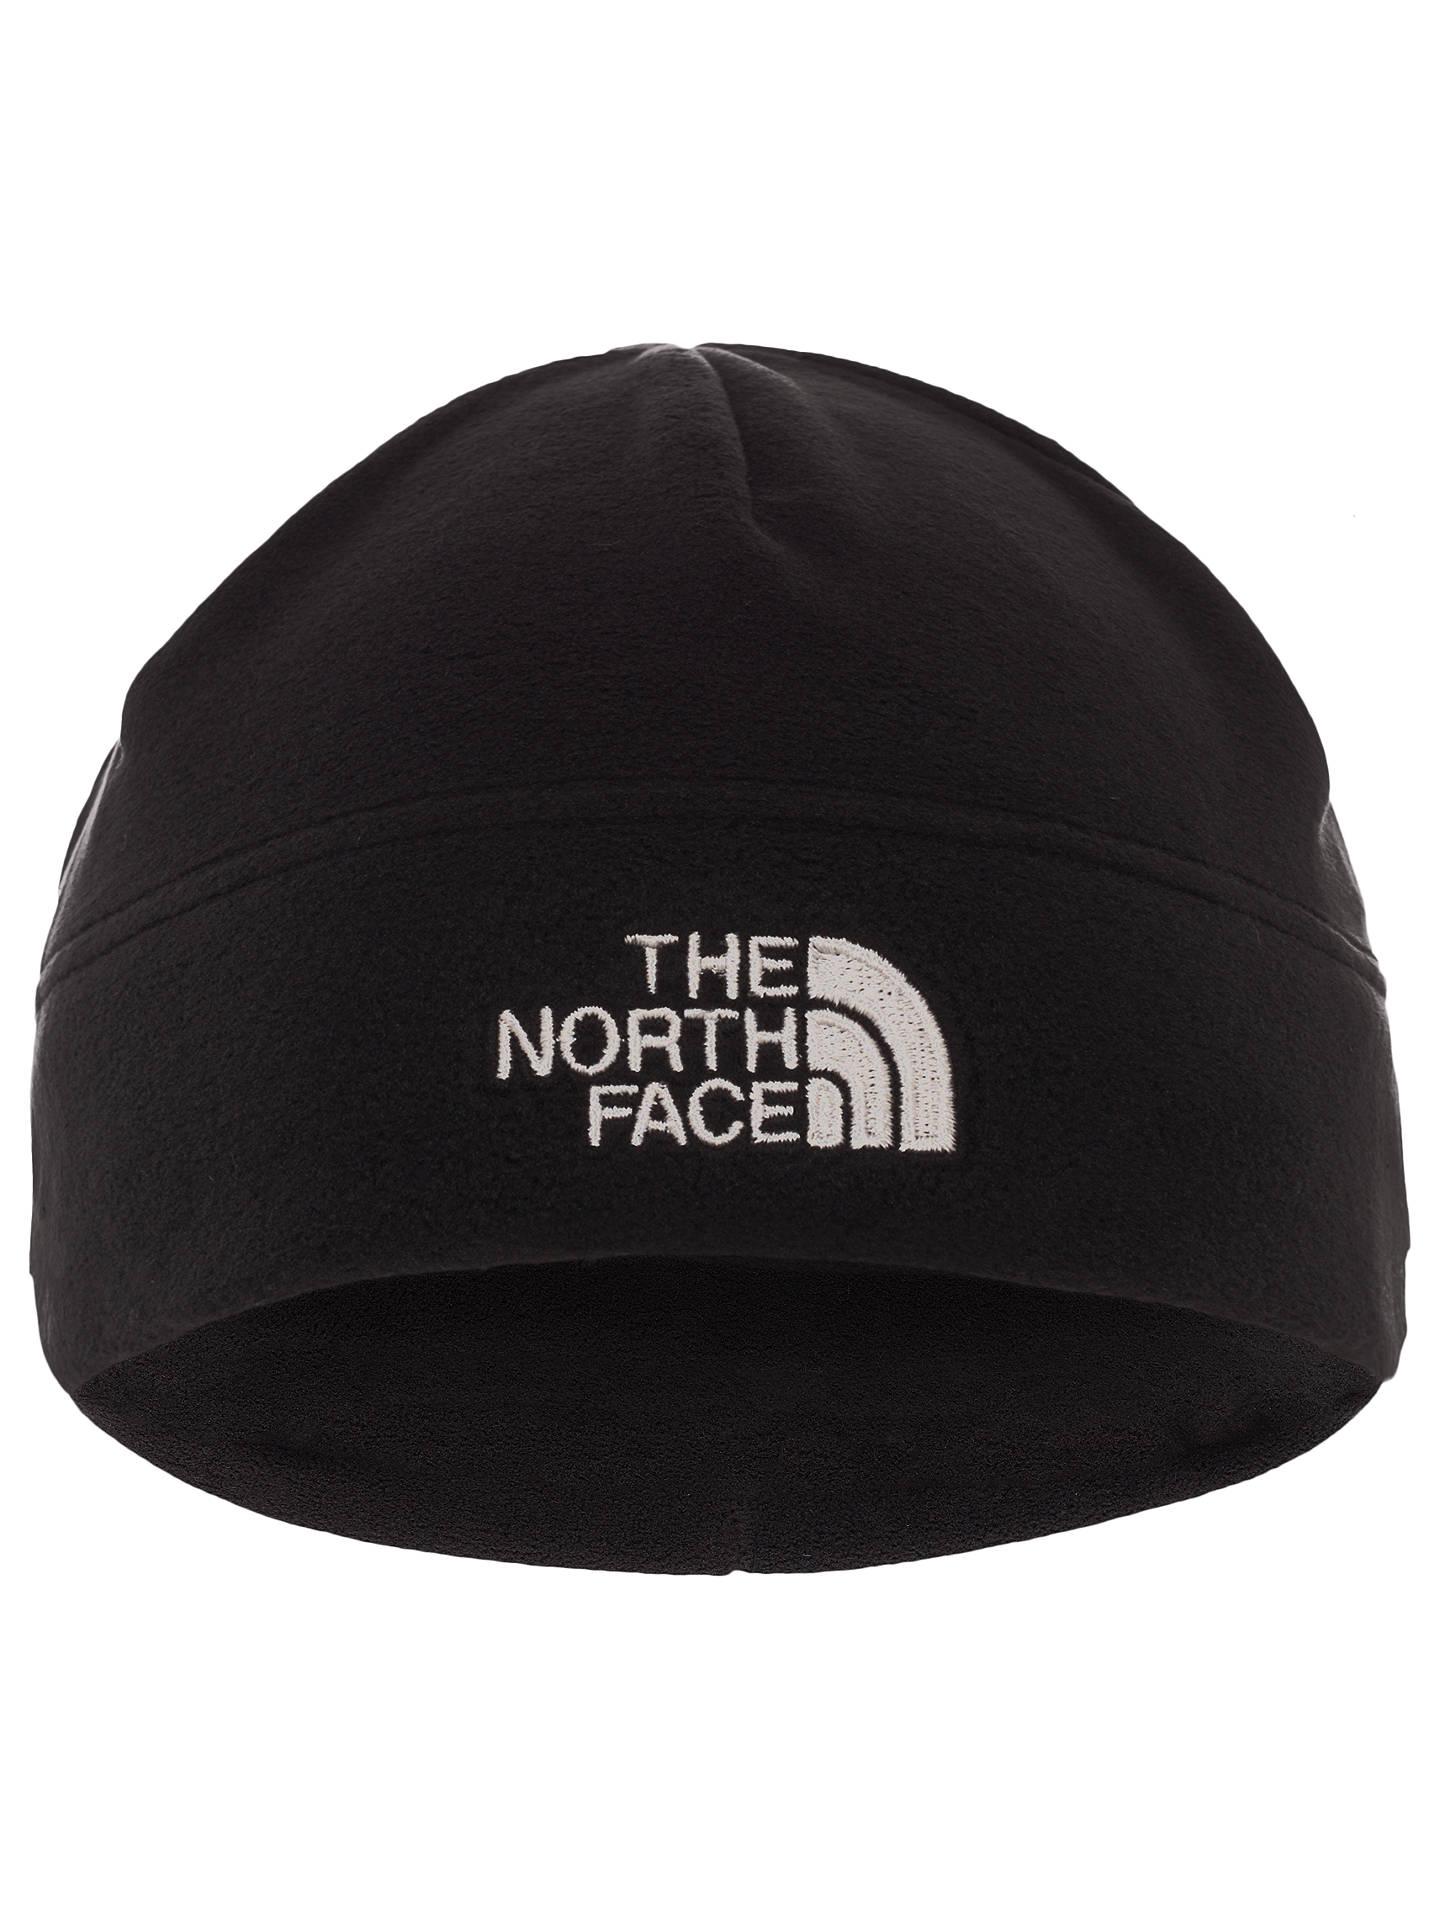 BuyThe North Face Flash Fleece Beanie a955d68d3c6